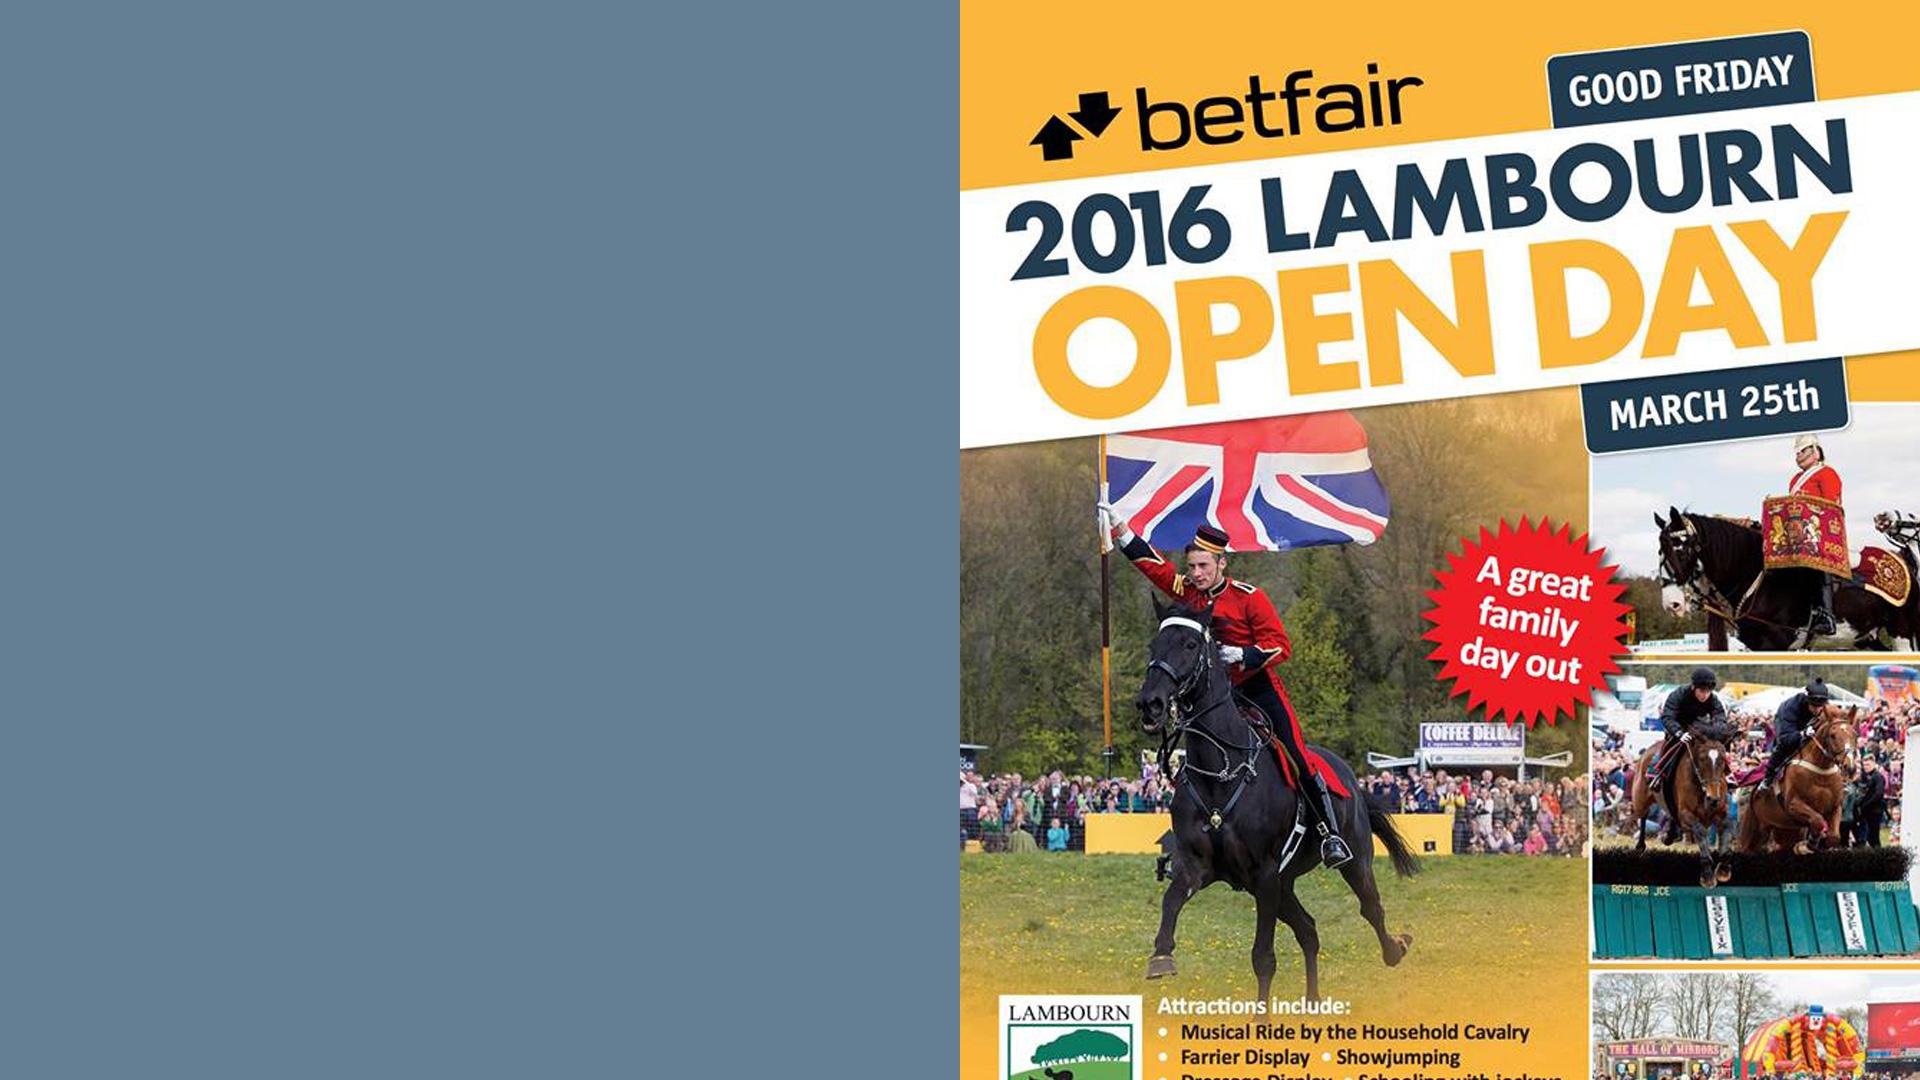 Lambourn Open Day 2016